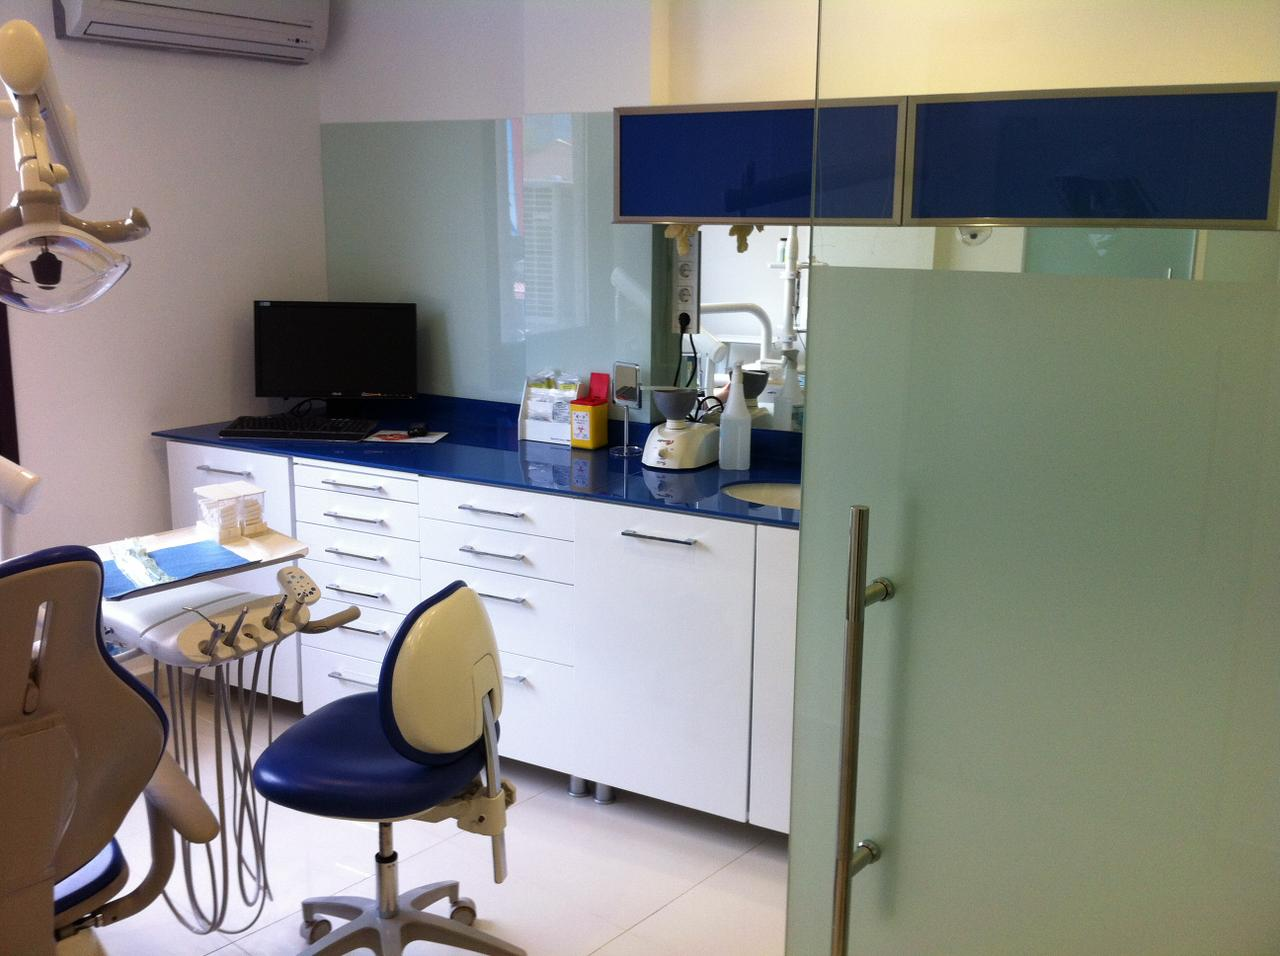 BilgeIldiri_DentalClinic-5.JPG